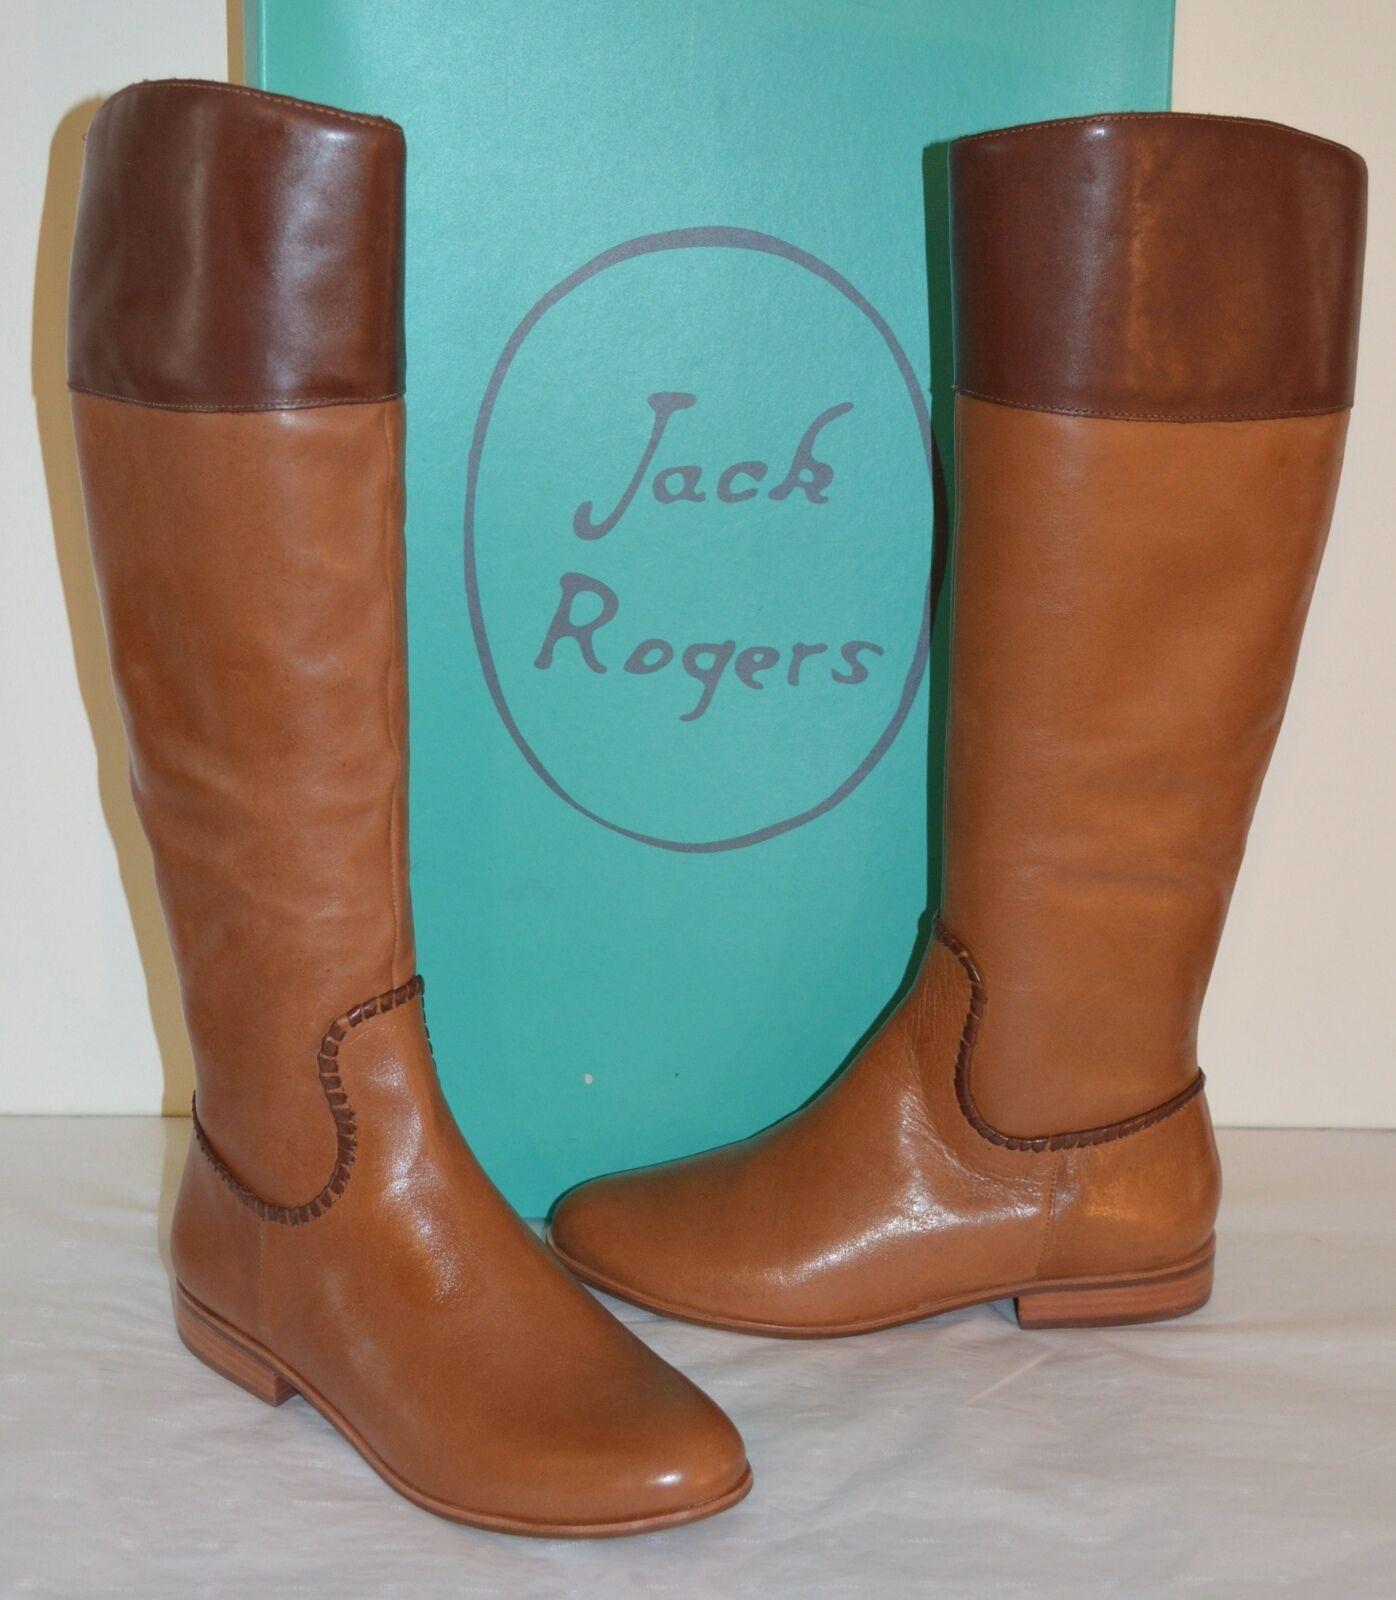 New $298 Jack Rogers Mercer II Oak/Tan/Brown Leather Riding/Tall Boot sz 8.5